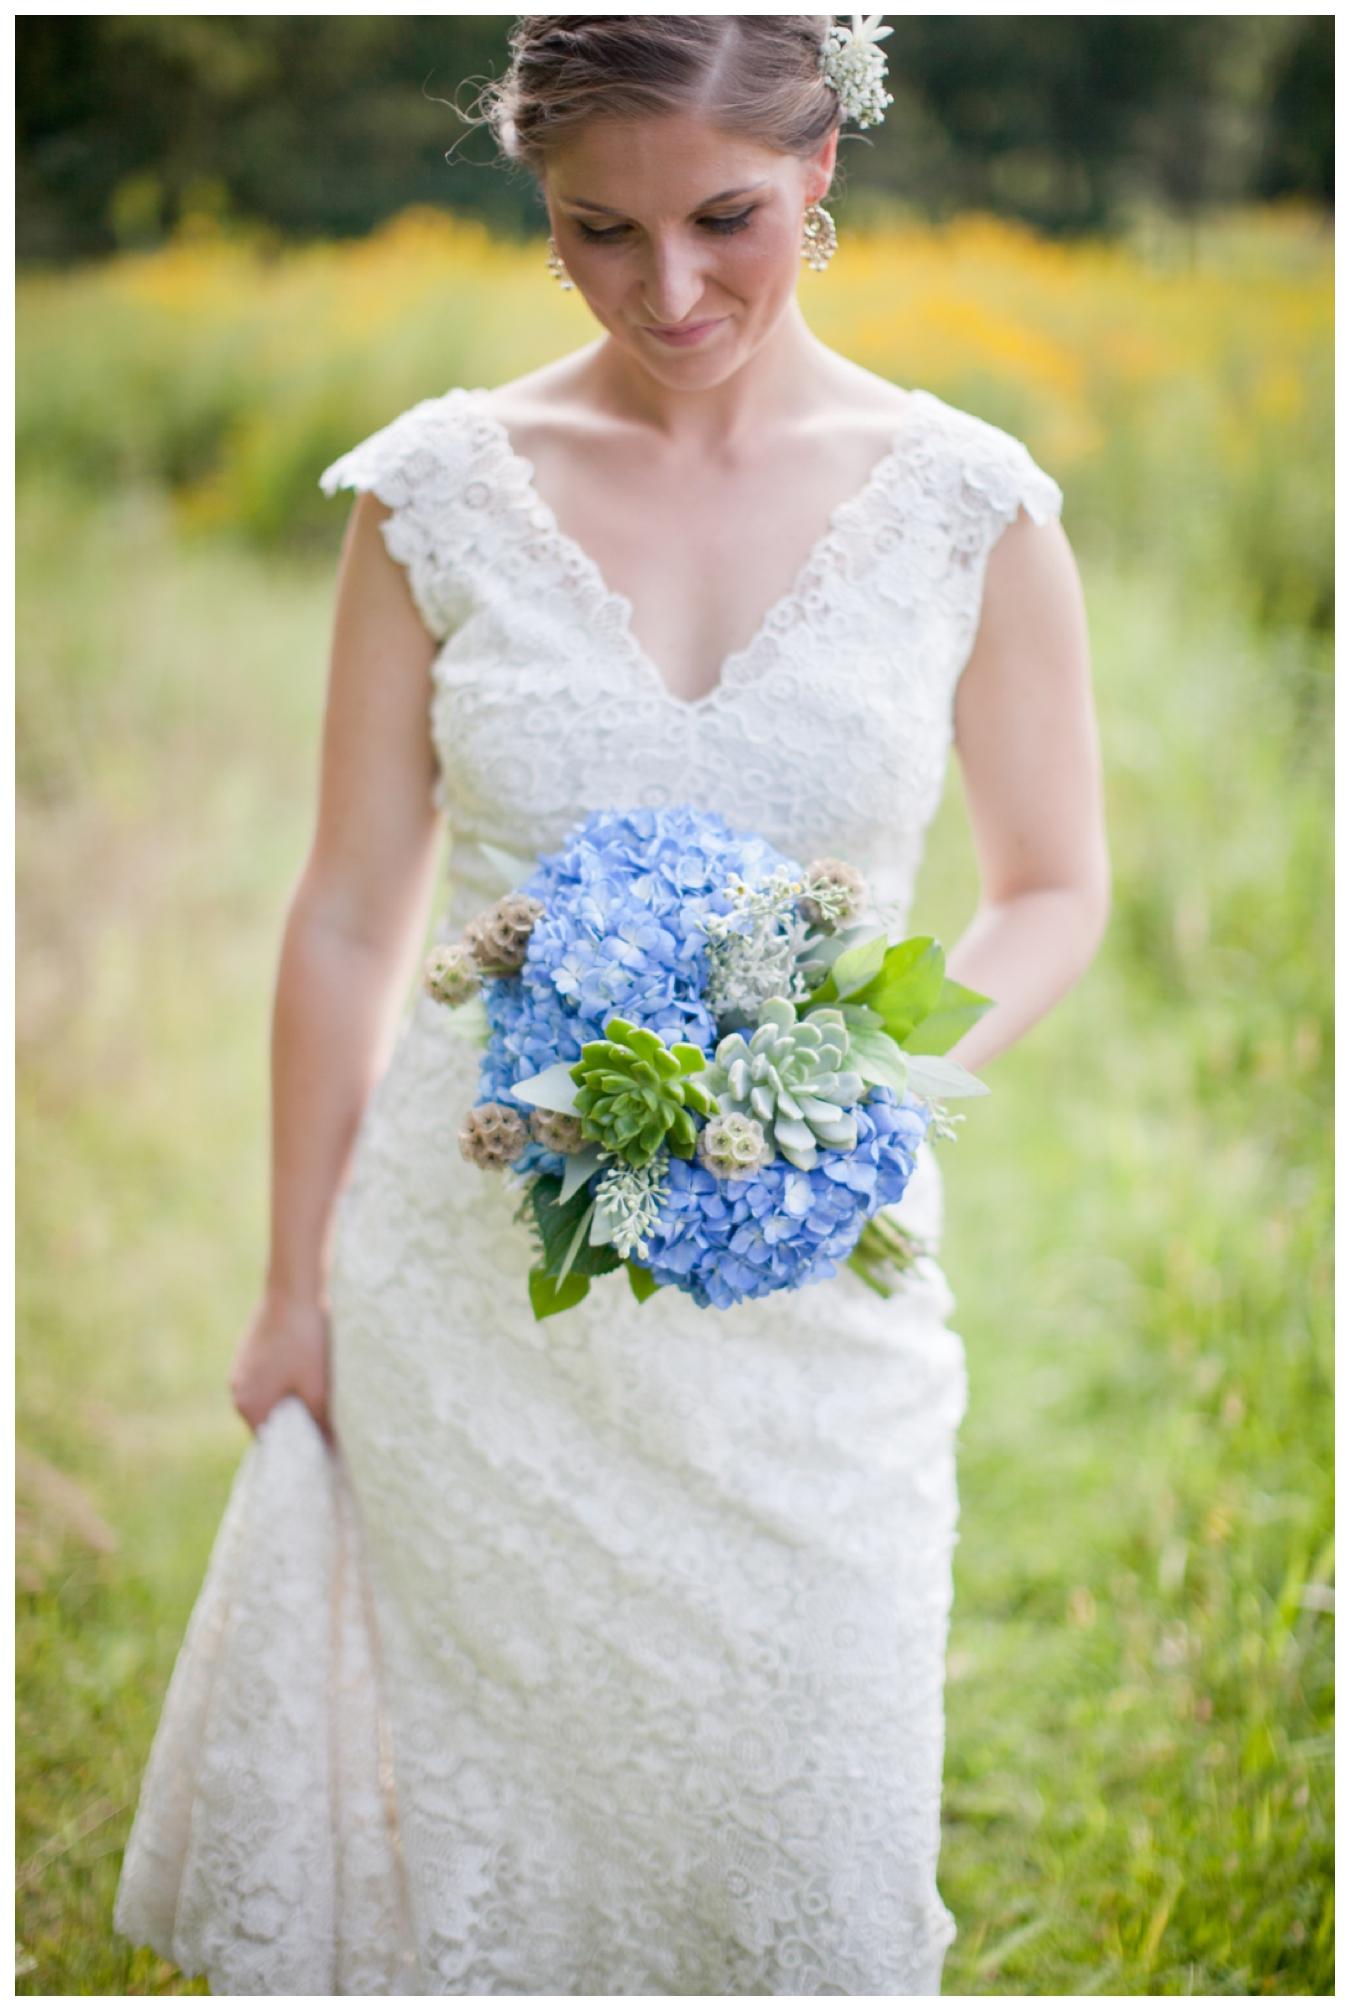 Lily Glass Wedding Photography _Columbus Ohio Farm Wedding17.jpg